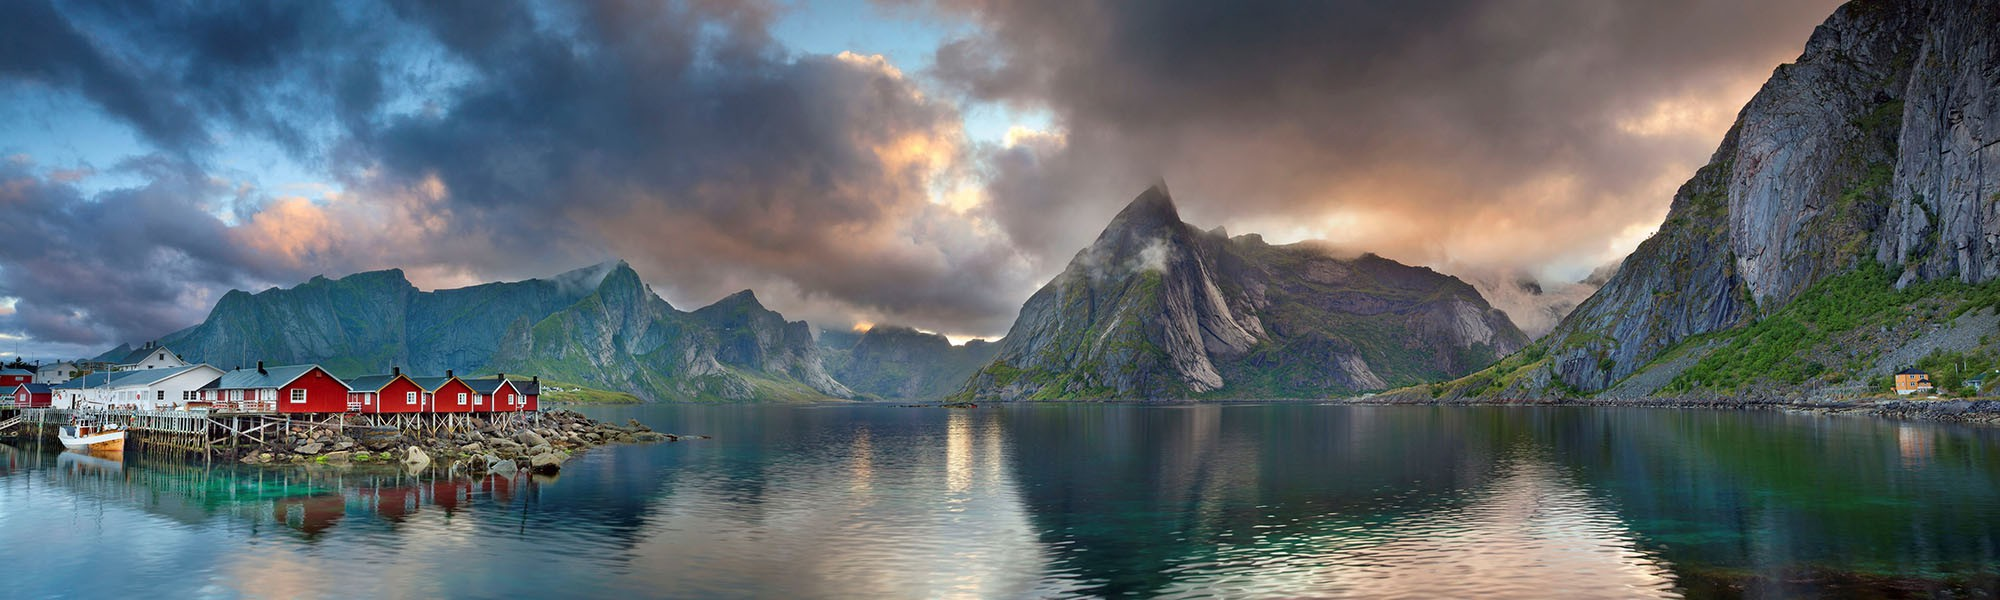 Norway Keyvisual